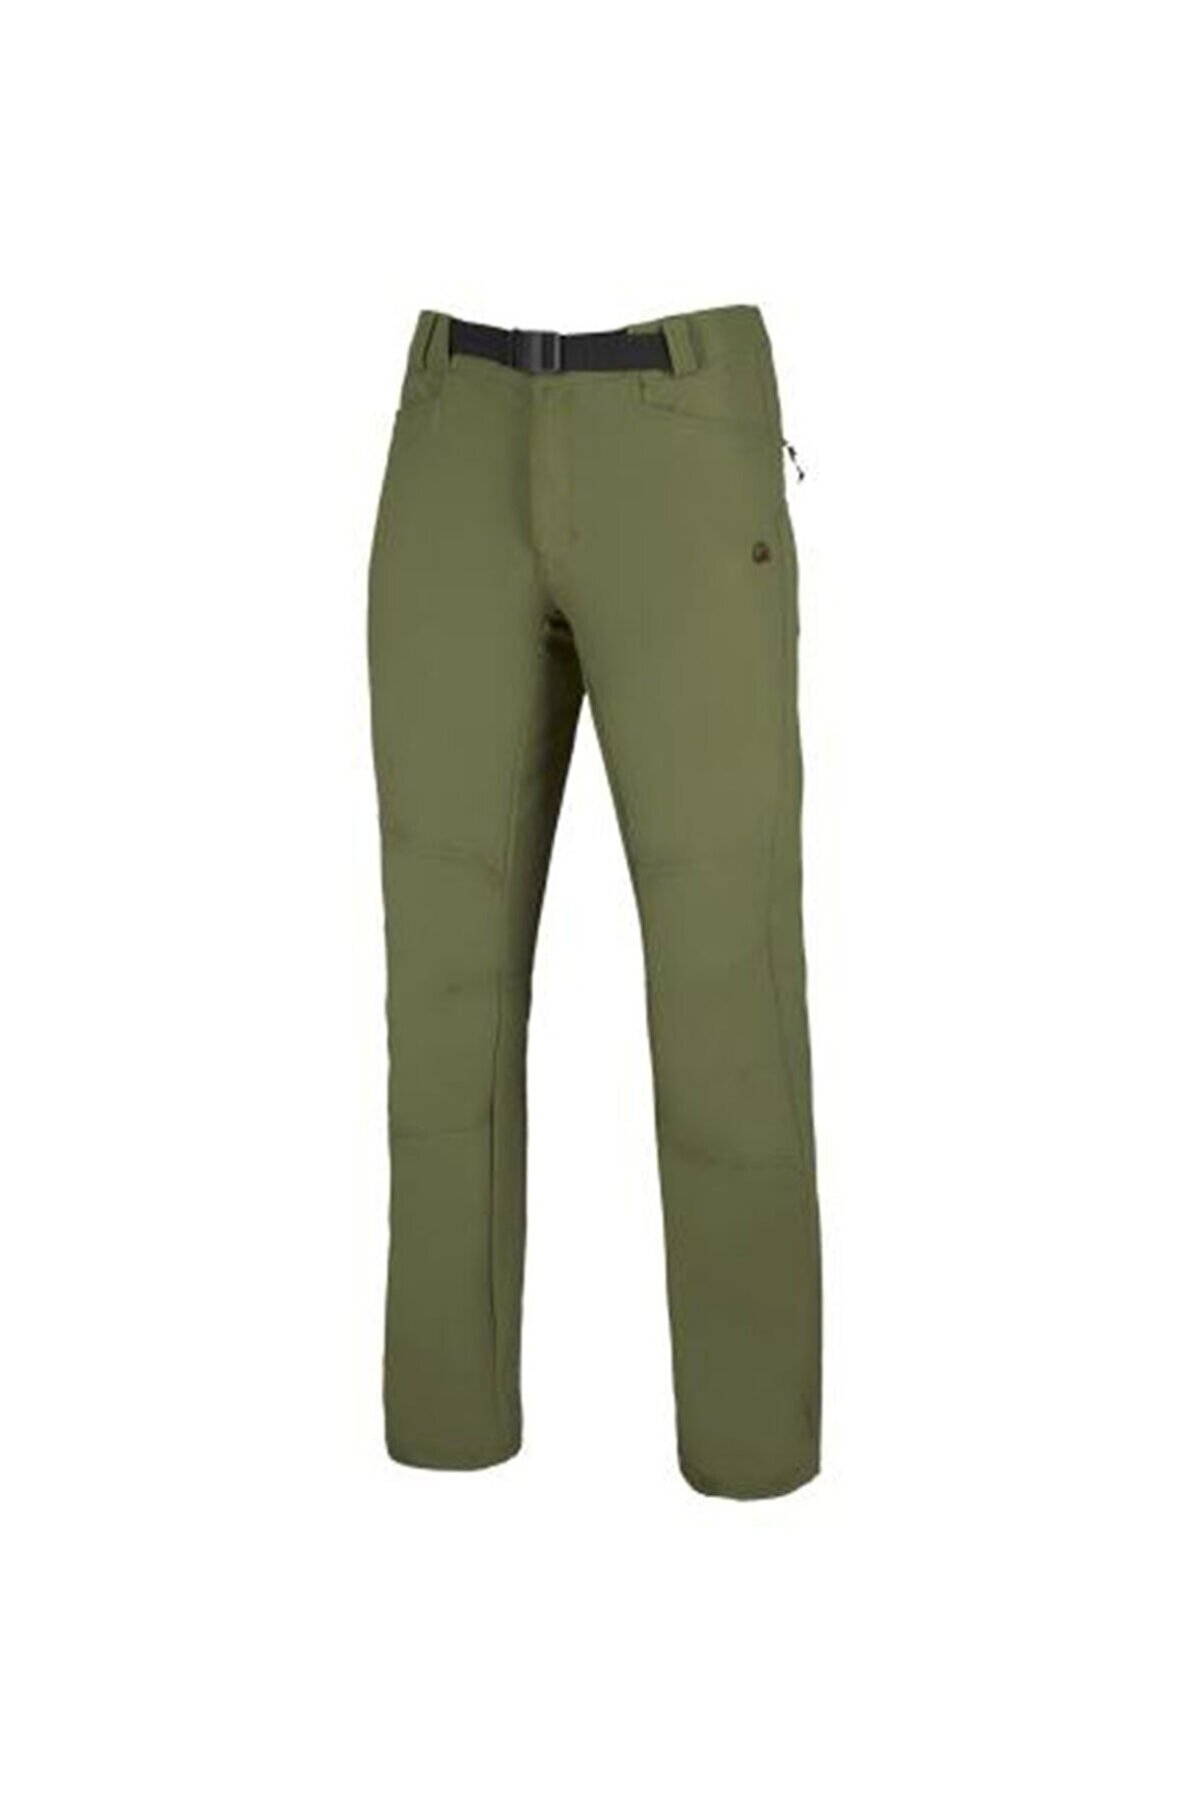 BERG Malpelo Trekking Erkek Pantolon